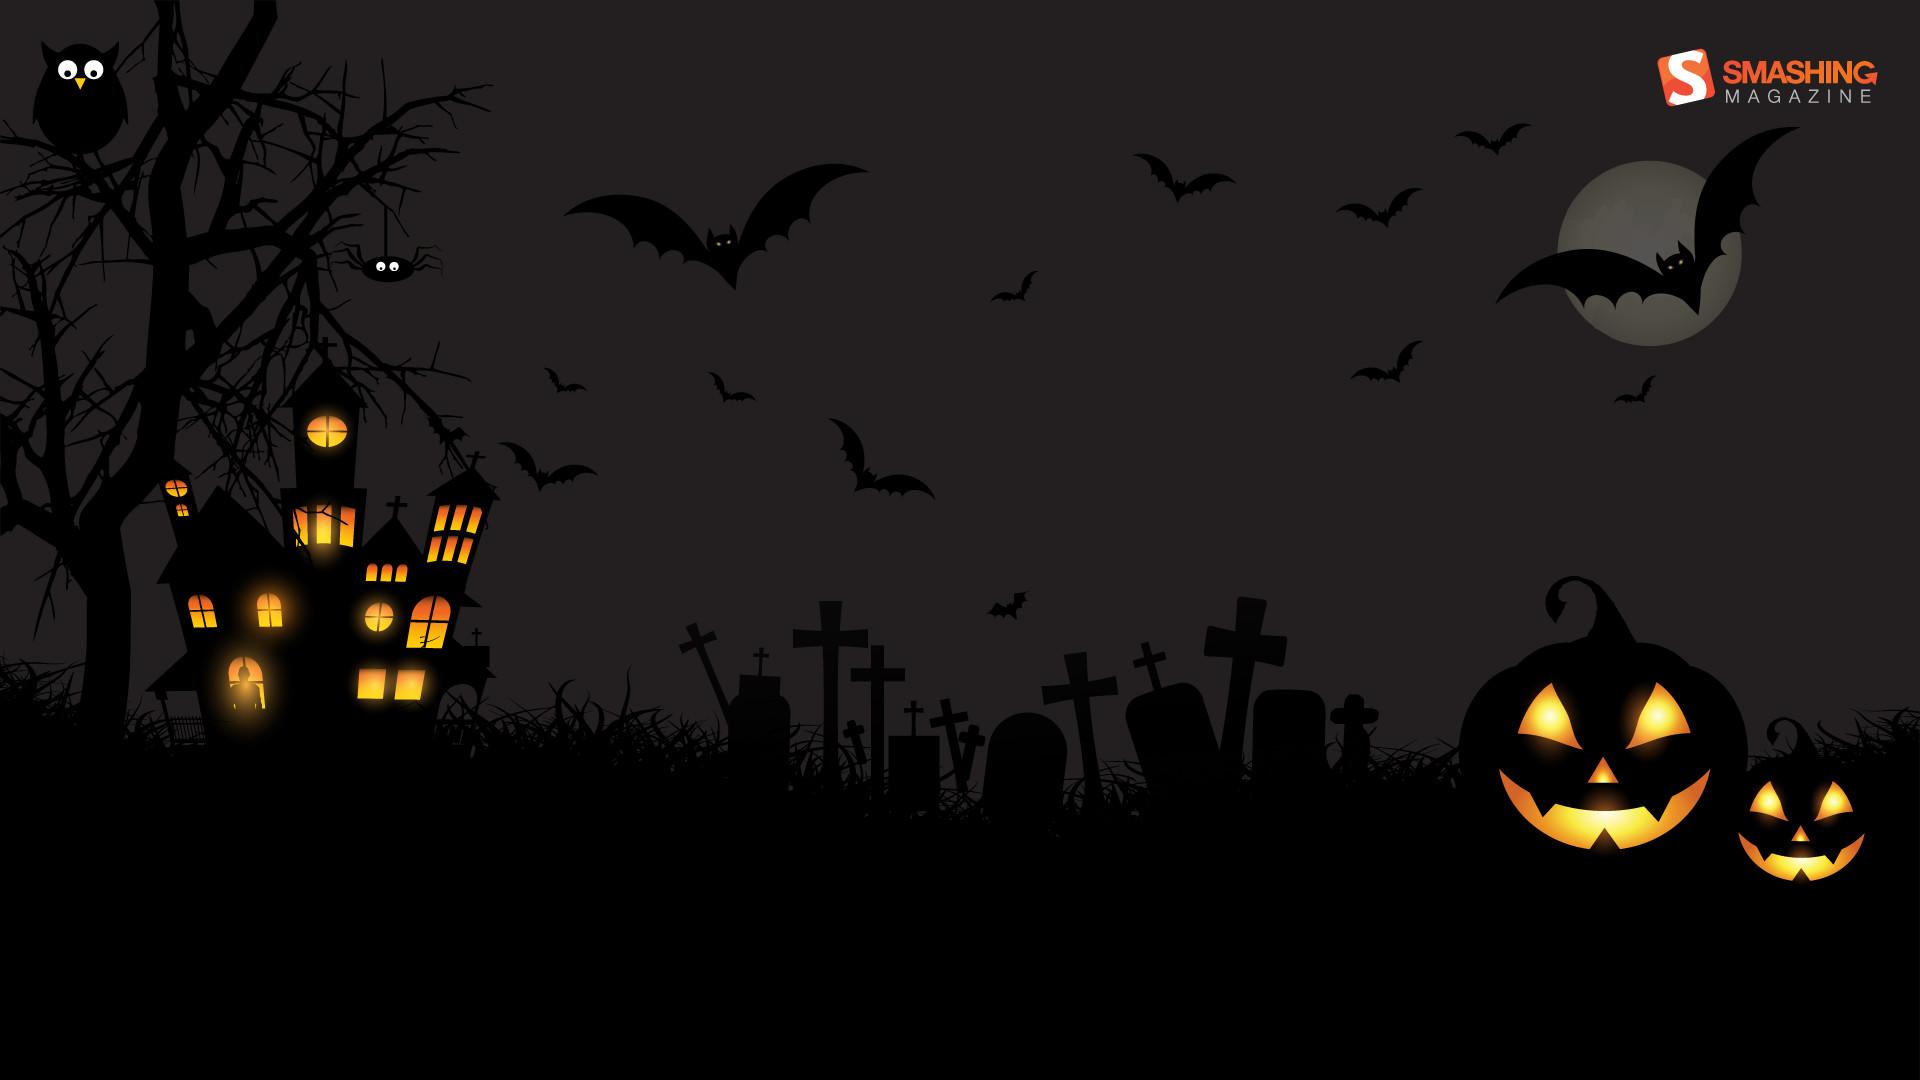 Scary desktop wallpaper wallpapertag - Scary halloween wallpaper ...